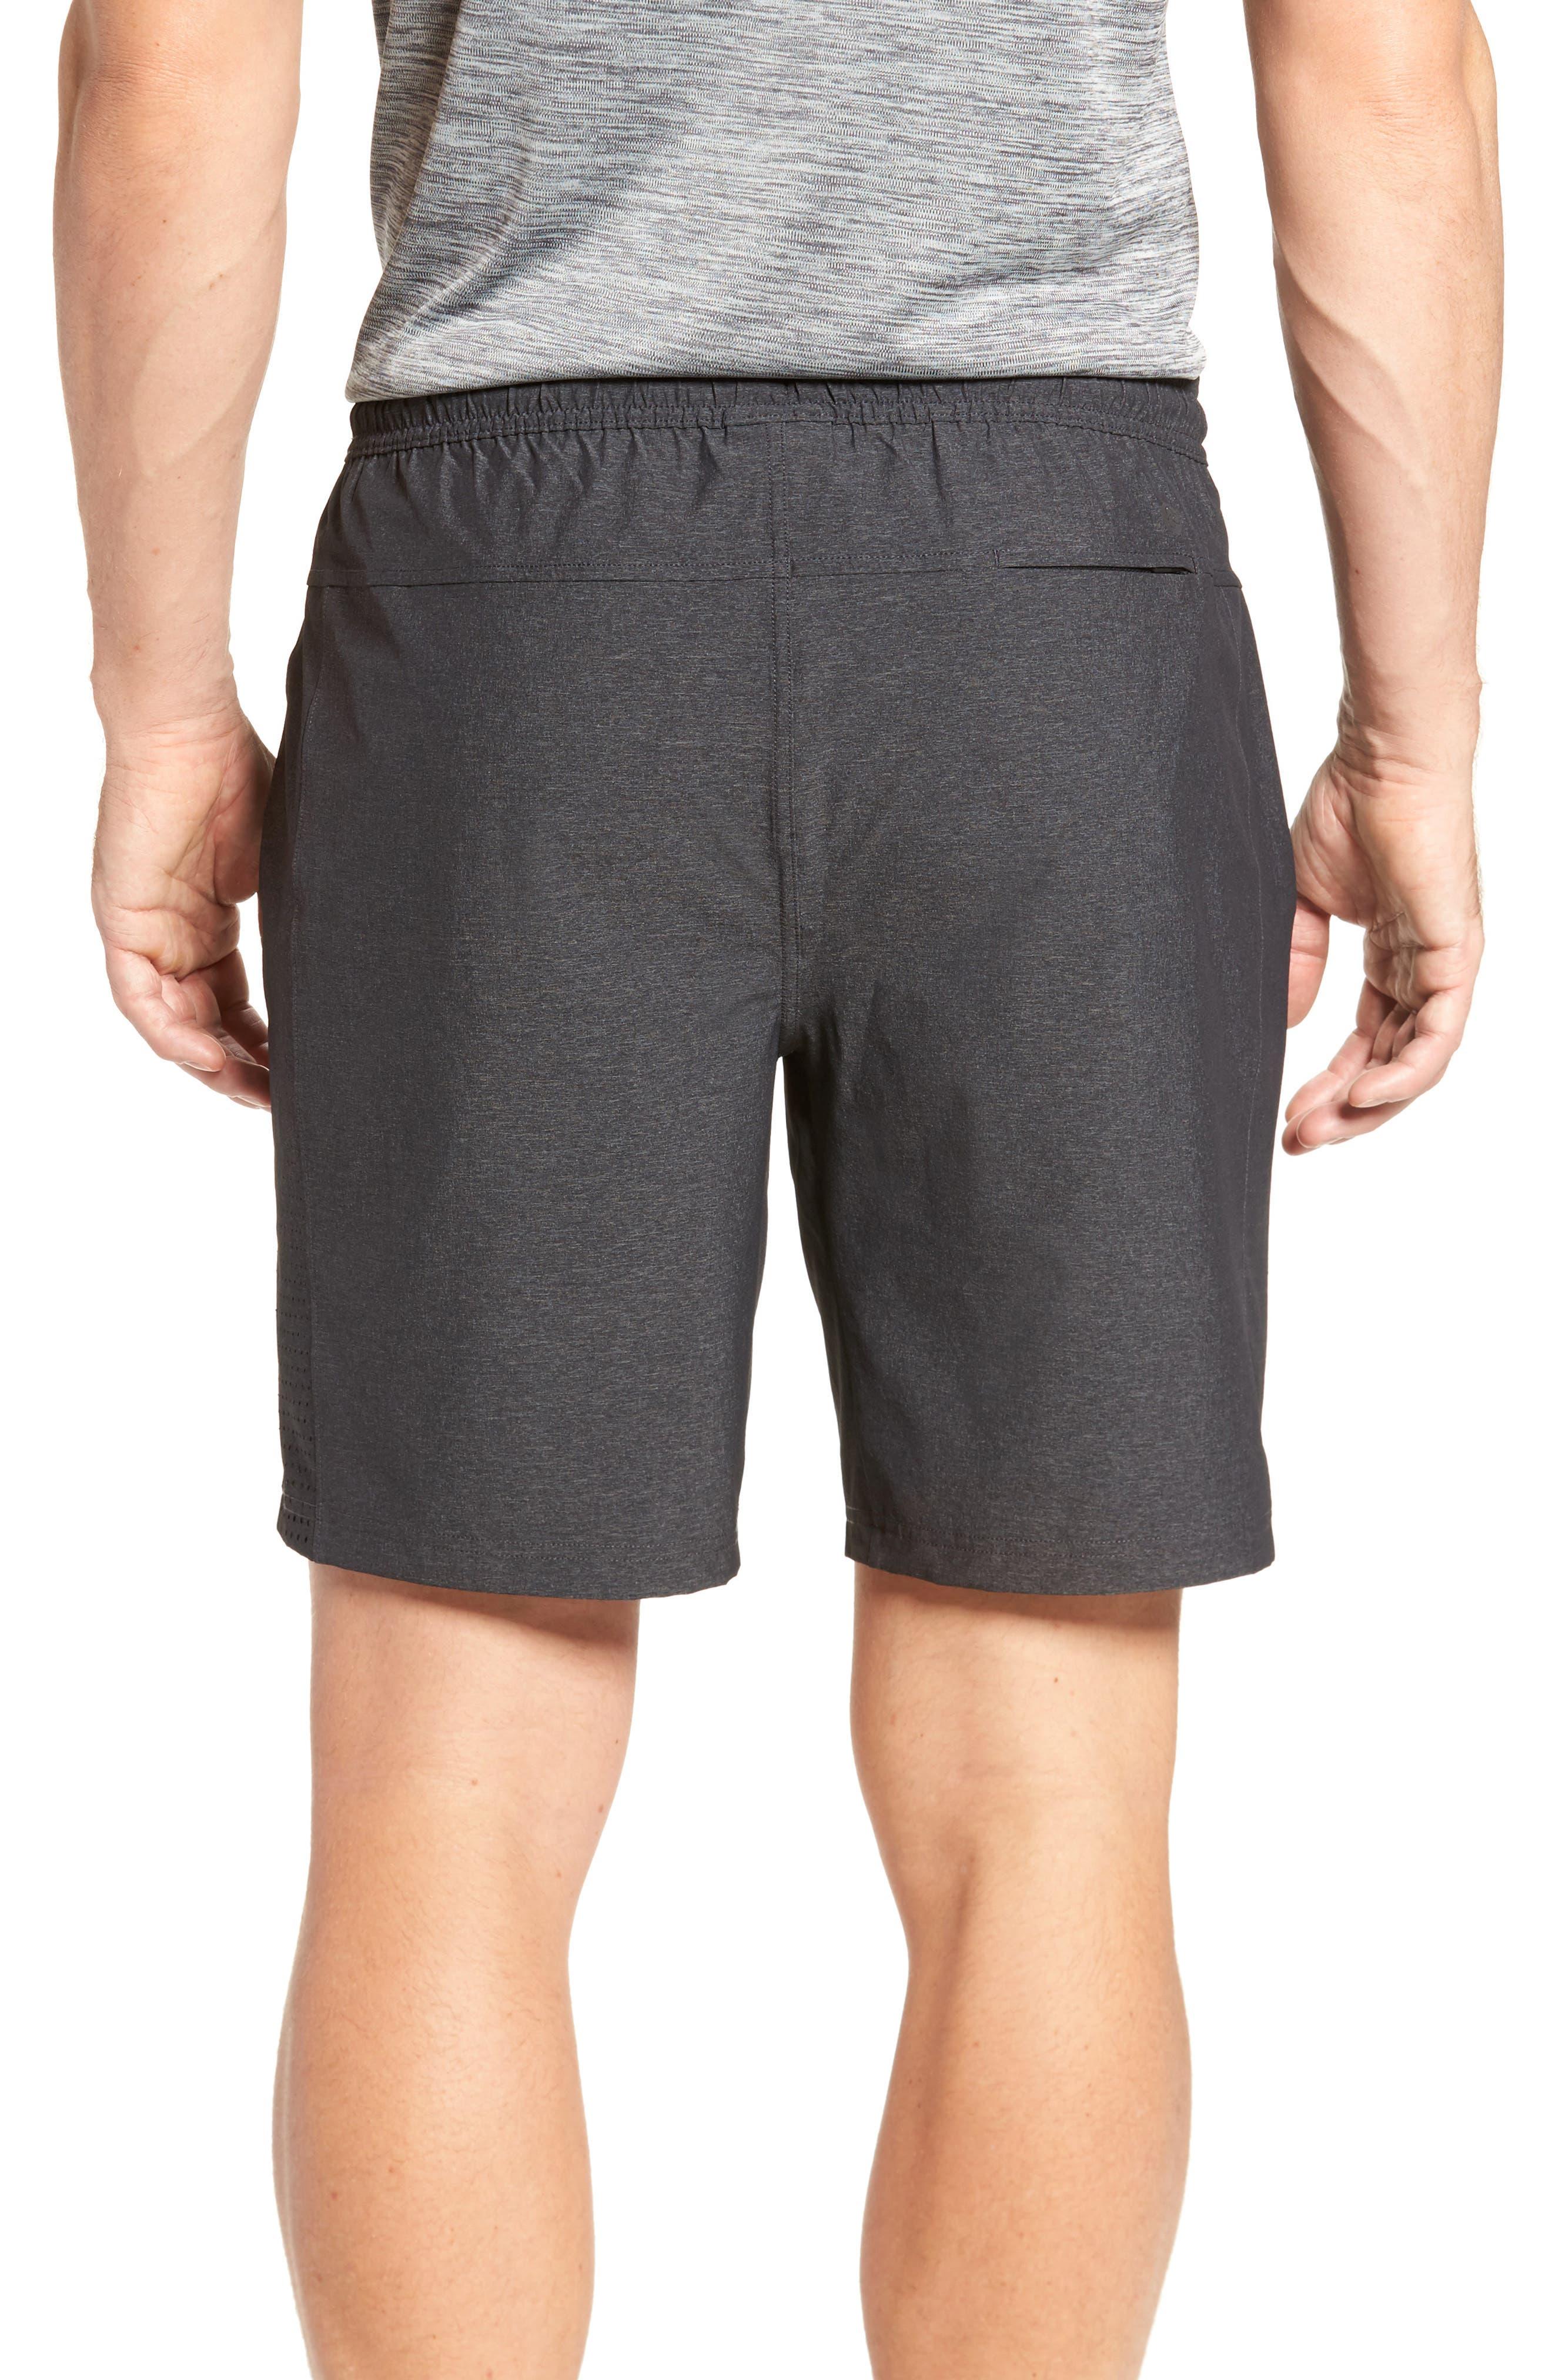 Alternate Image 2  - Zella Graphite Shorts